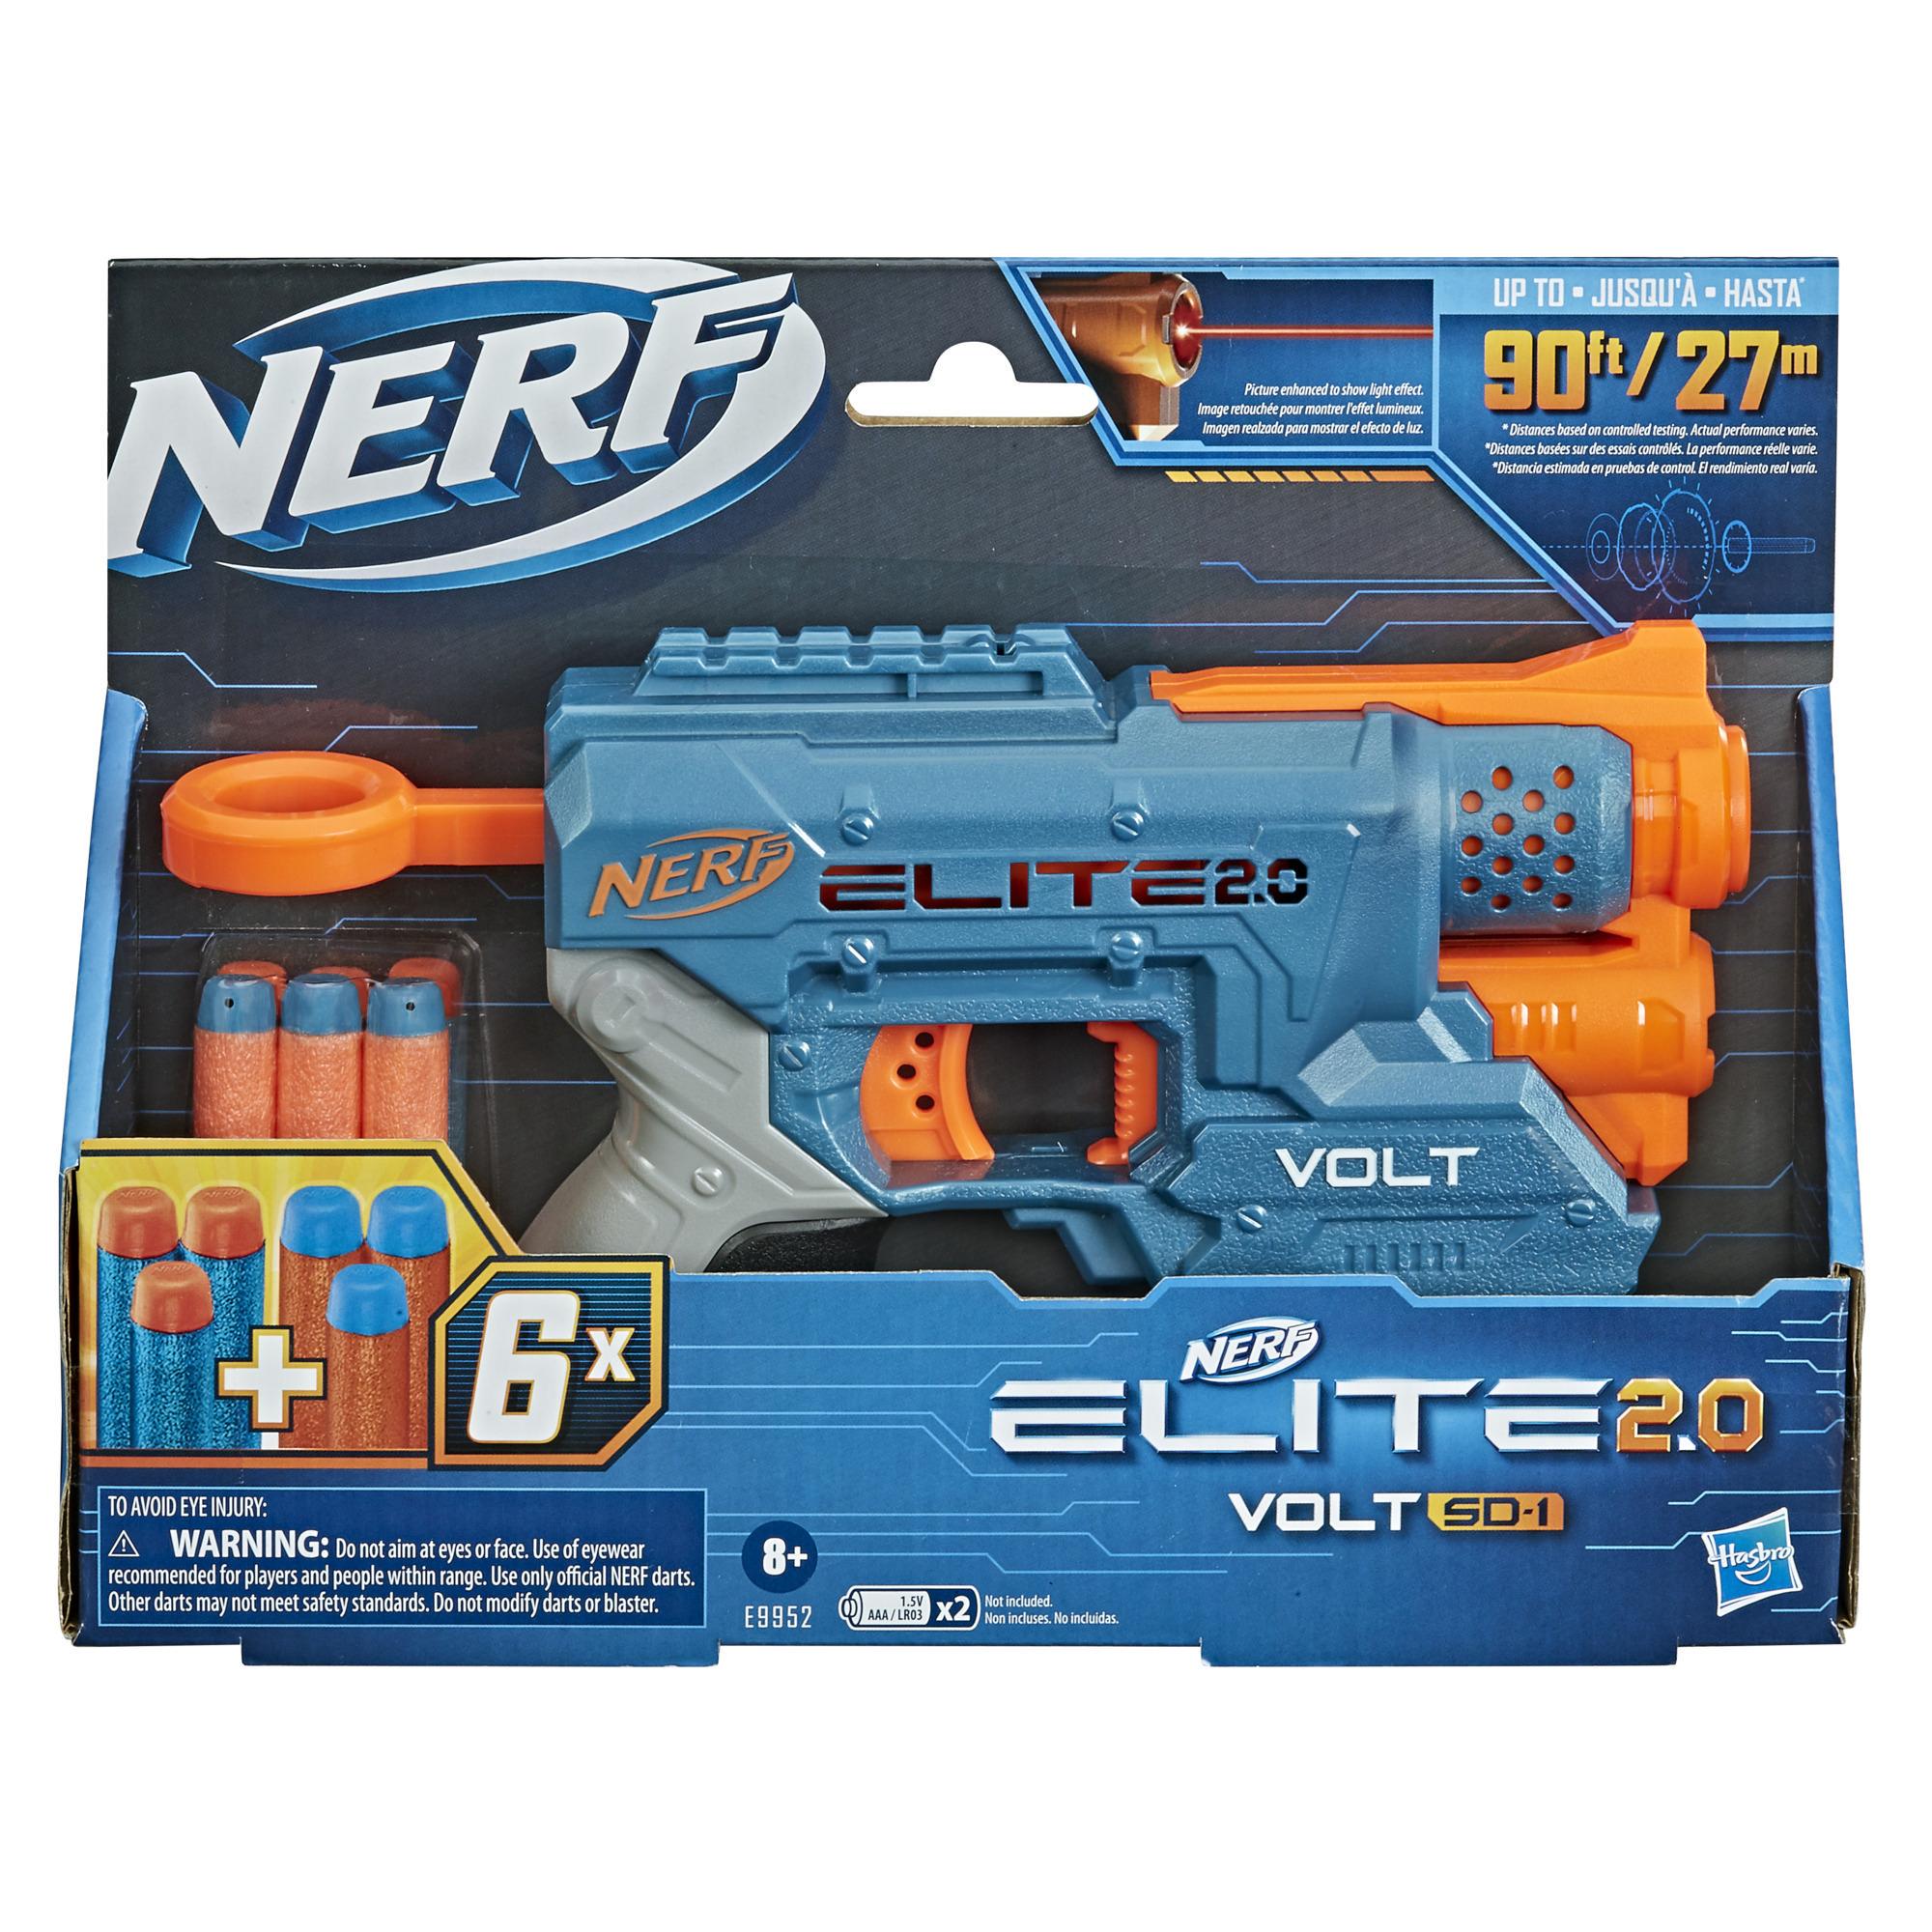 Nerf Elite 2.0 Volt SD-1 Εκτοξευτής -- 6 επίσημα βελάκια Nerf, Στόχευση με δέσμη φωτός, Θήκη για 2 βελάκια, 2 Στρατηγικοί οδηγοί